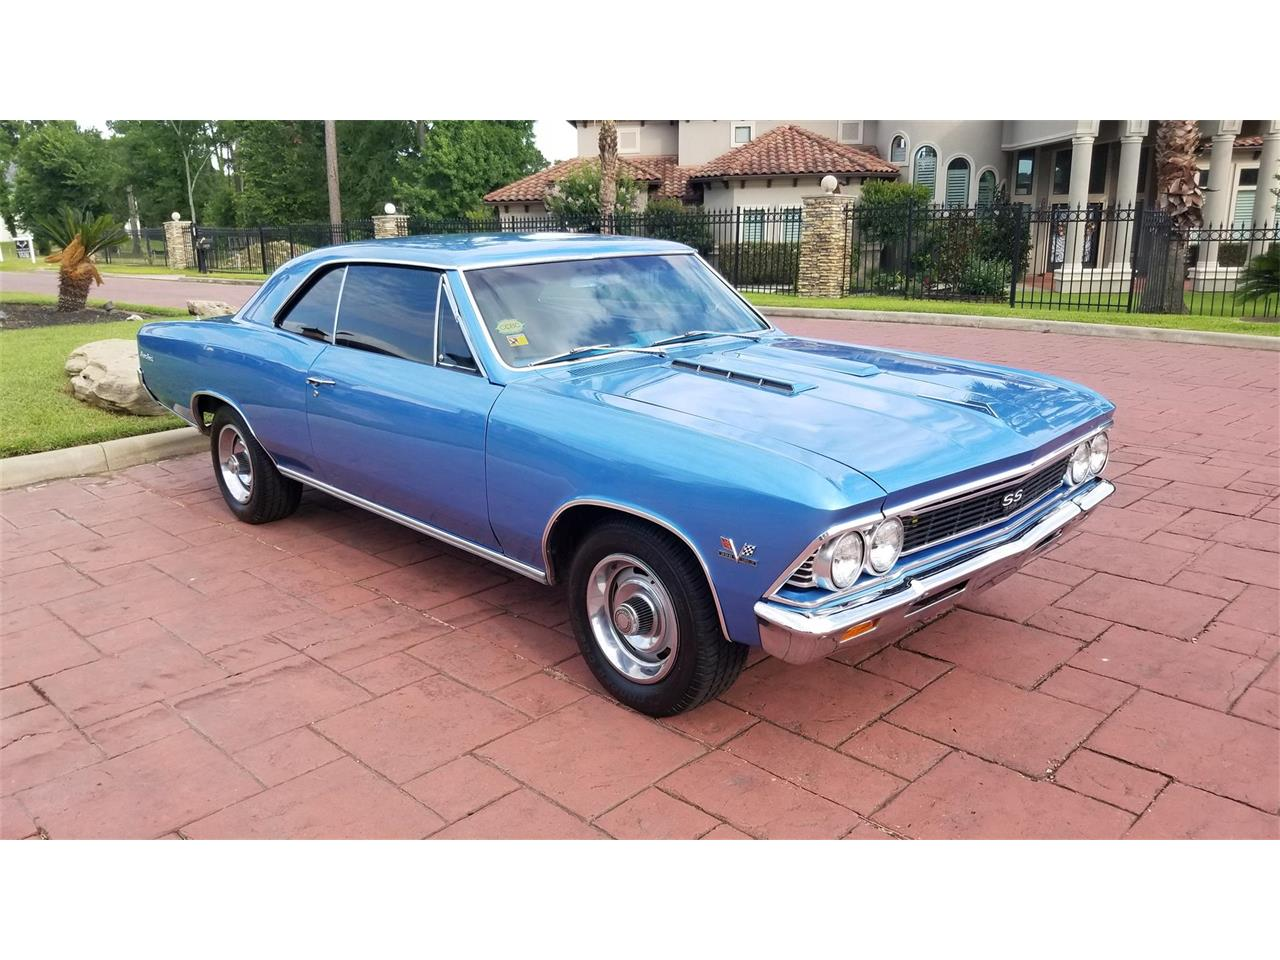 1966 Chevrolet Chevelle Ss For Sale Classiccars Com Cc